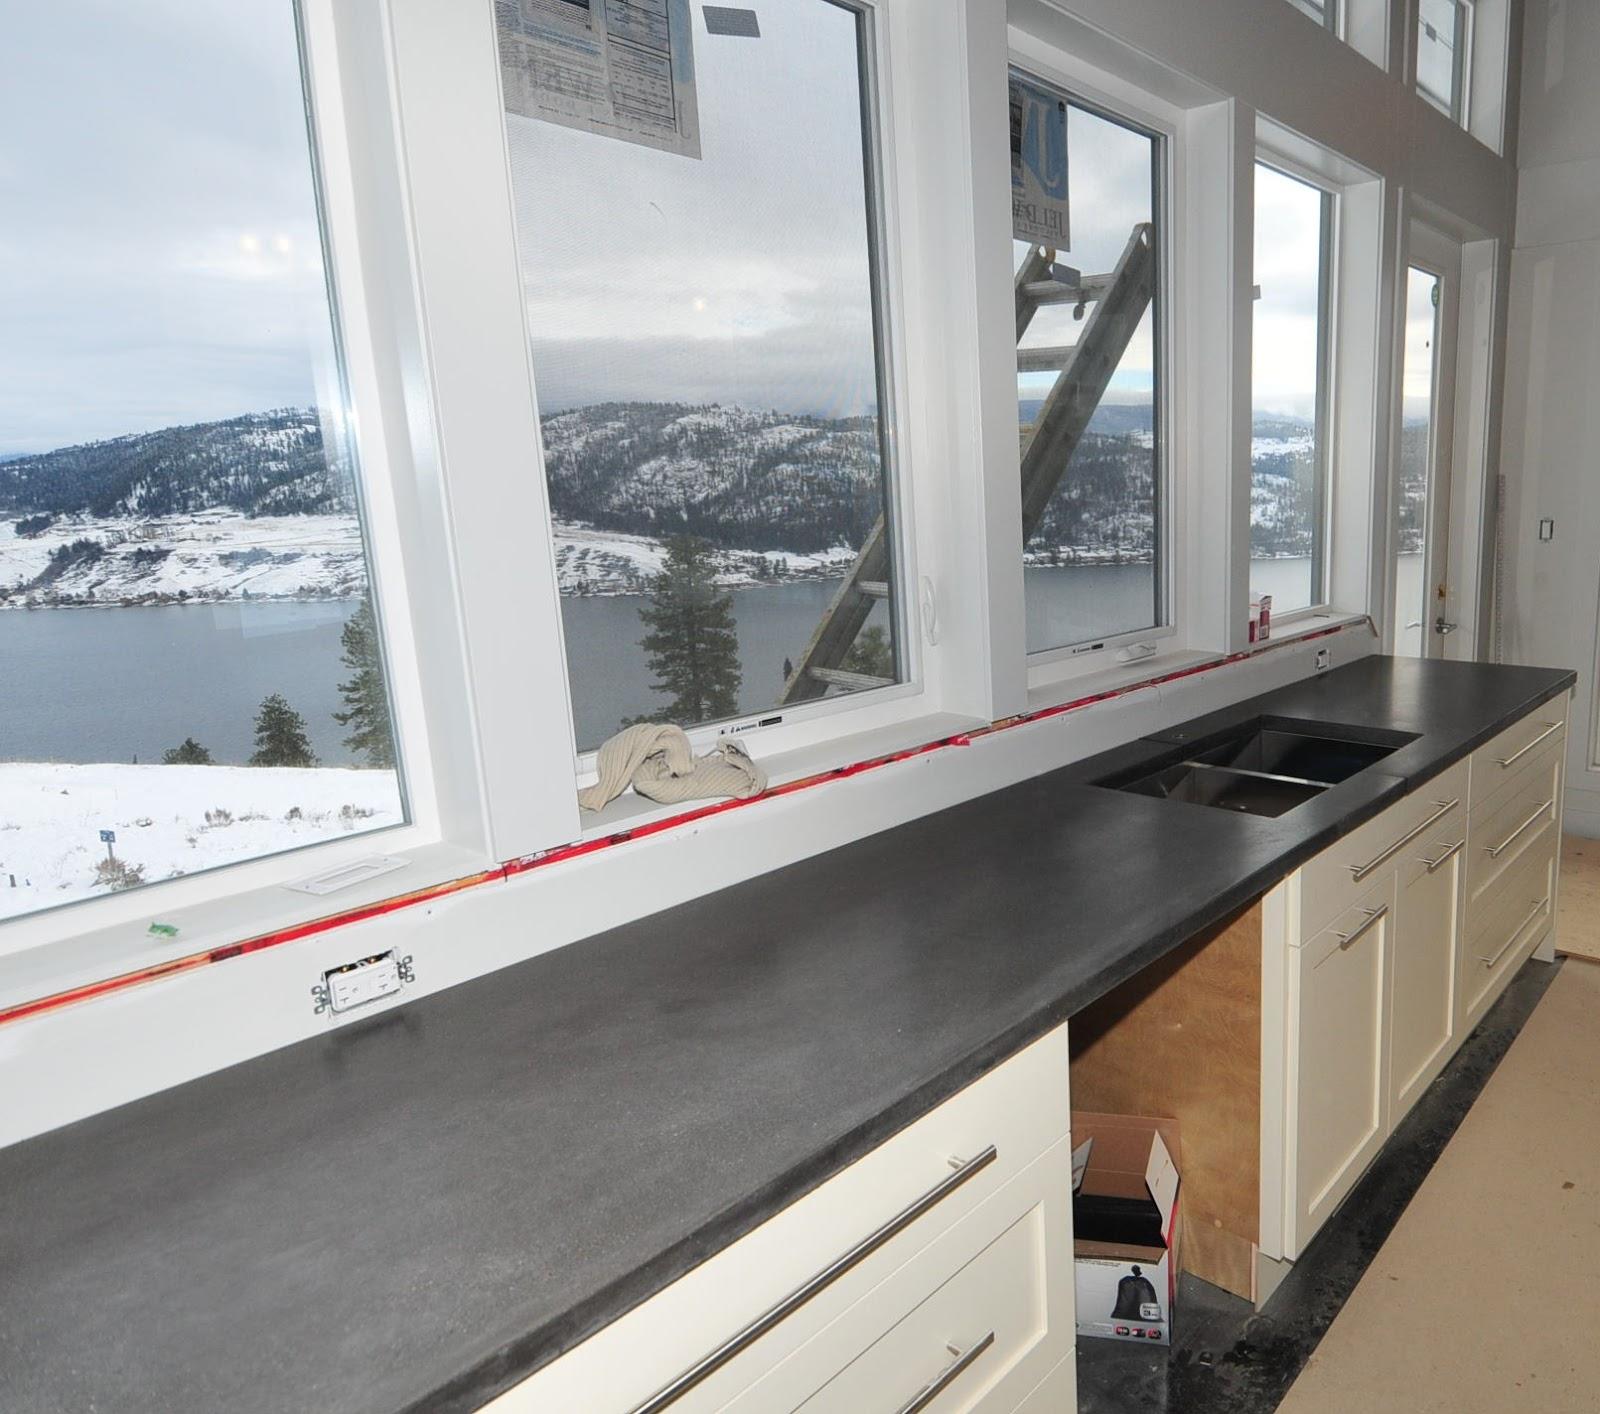 MODE CONCRETE: Modern Kitchen With Concrete Countertops